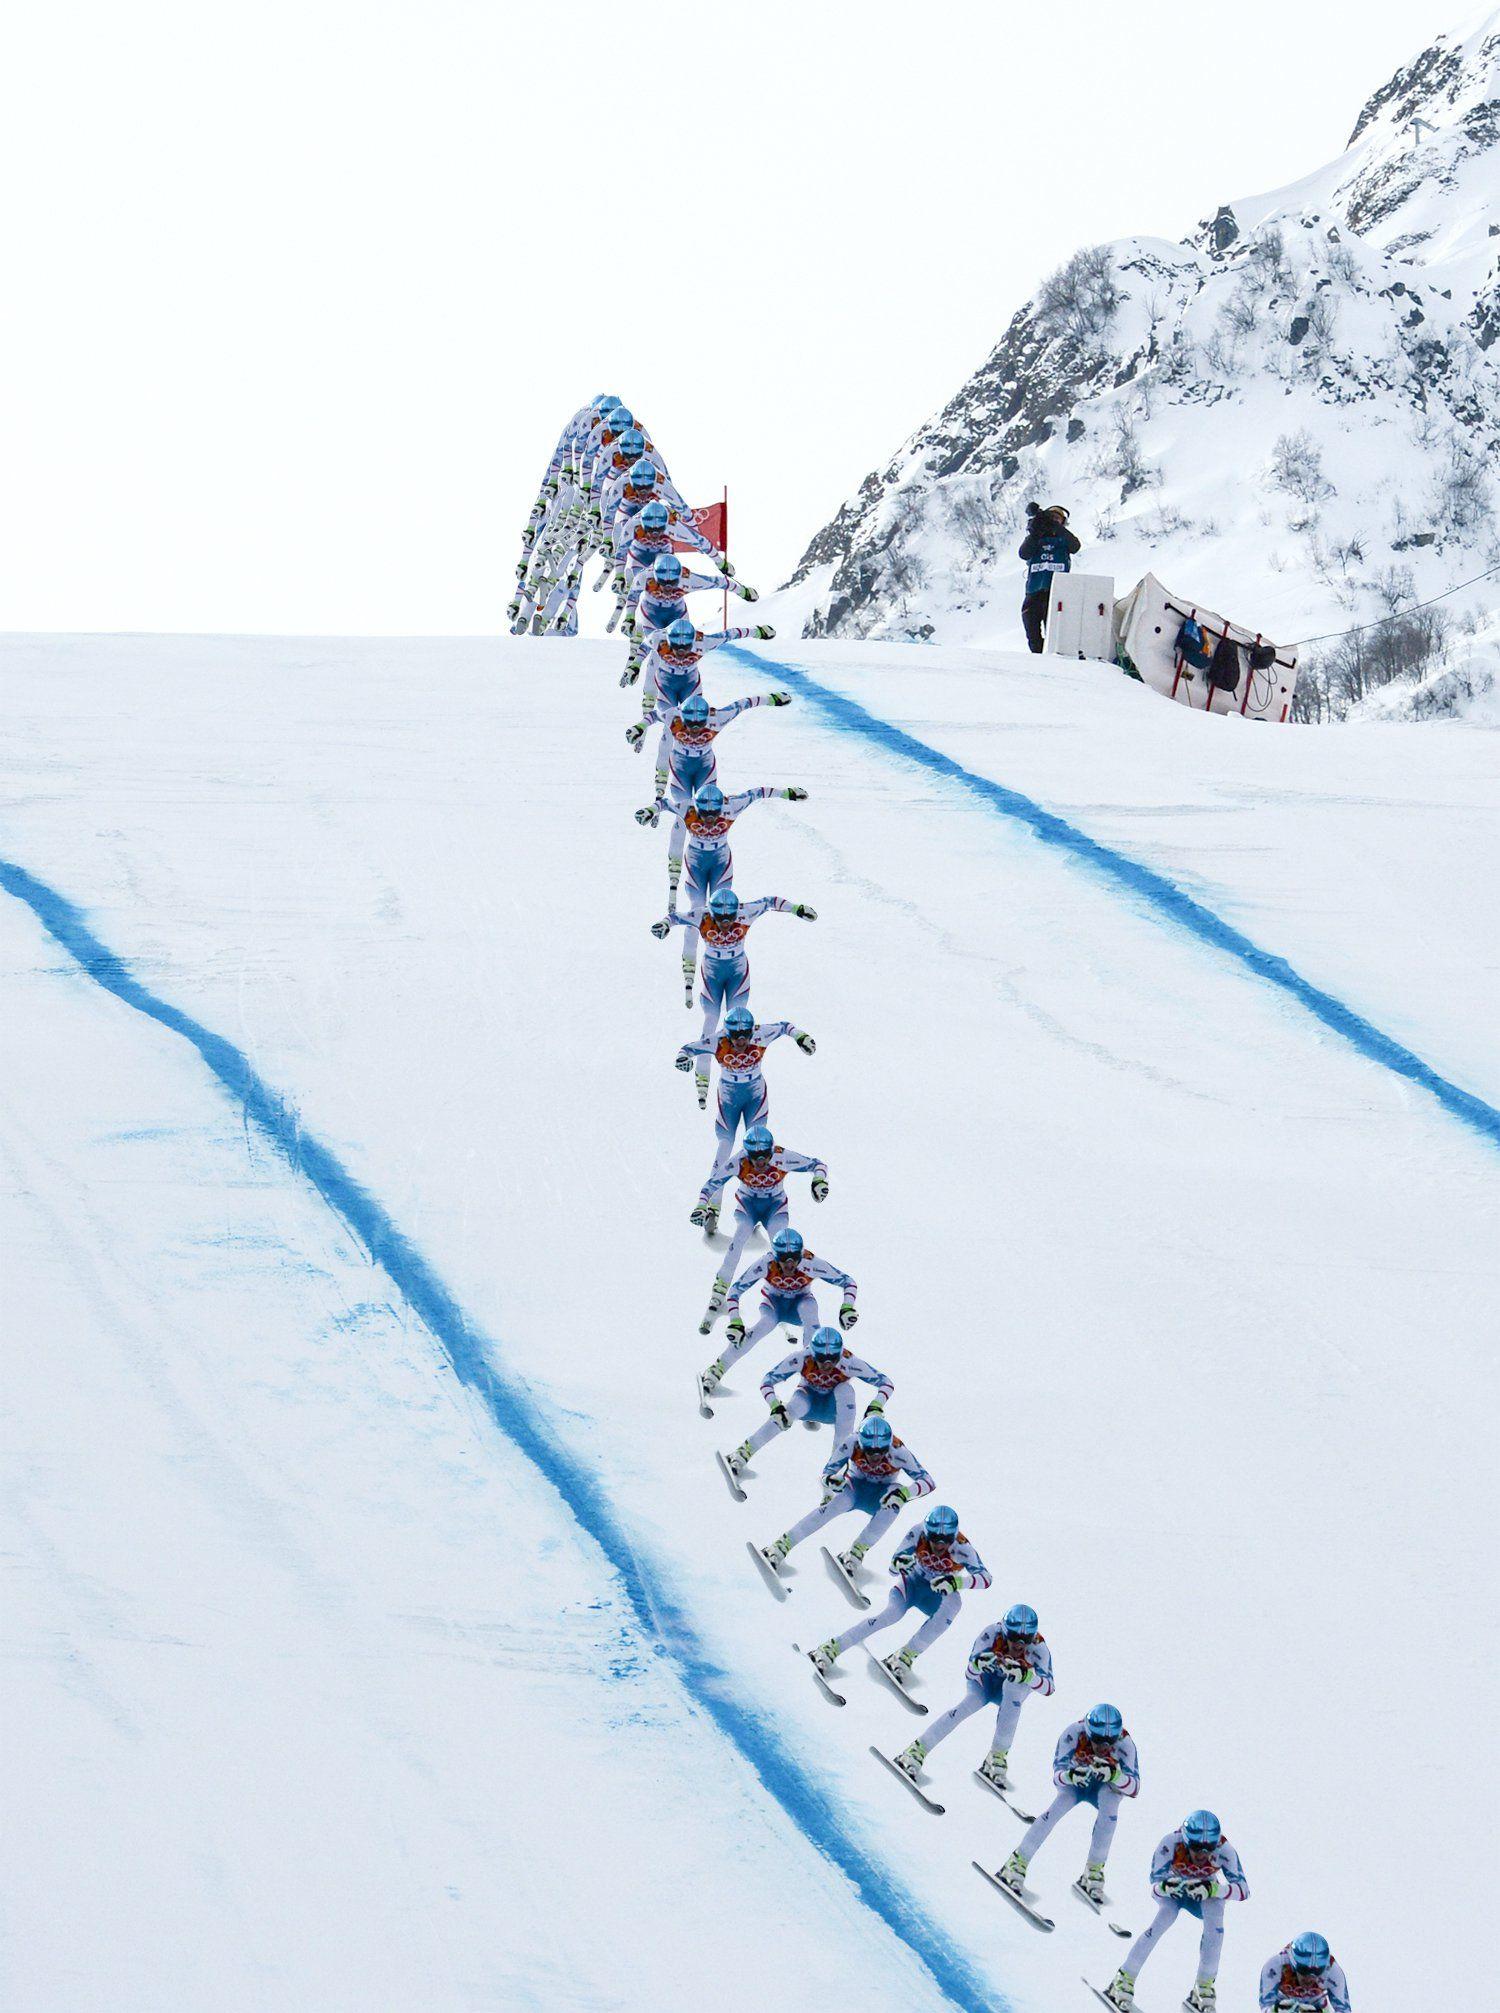 The Sochi Olympics Frame By Frame